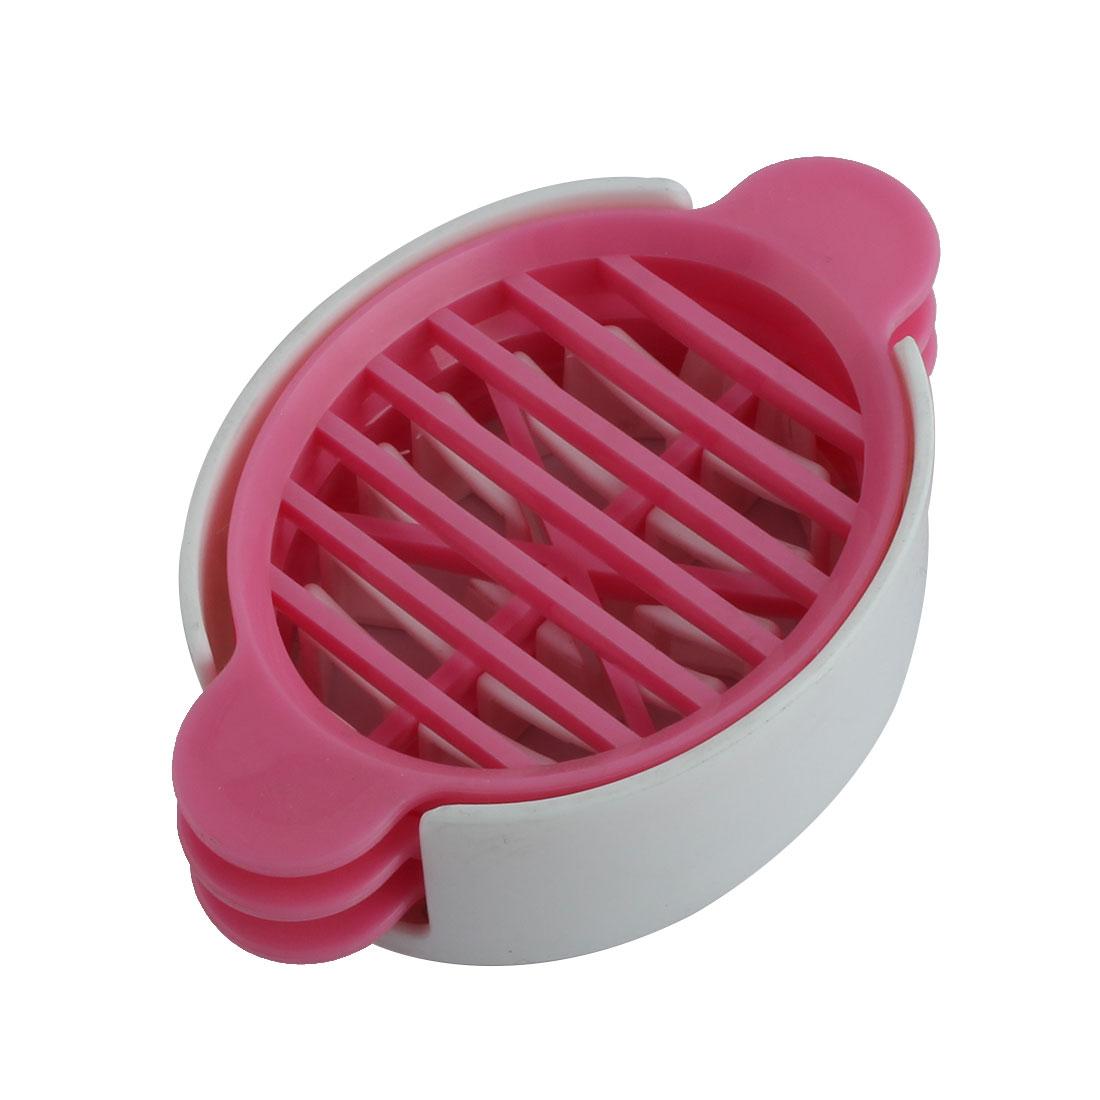 Home Kitchenware Plastic Three Ways Fruit Egg Wedge Slicer Cutter Tool Pink Set